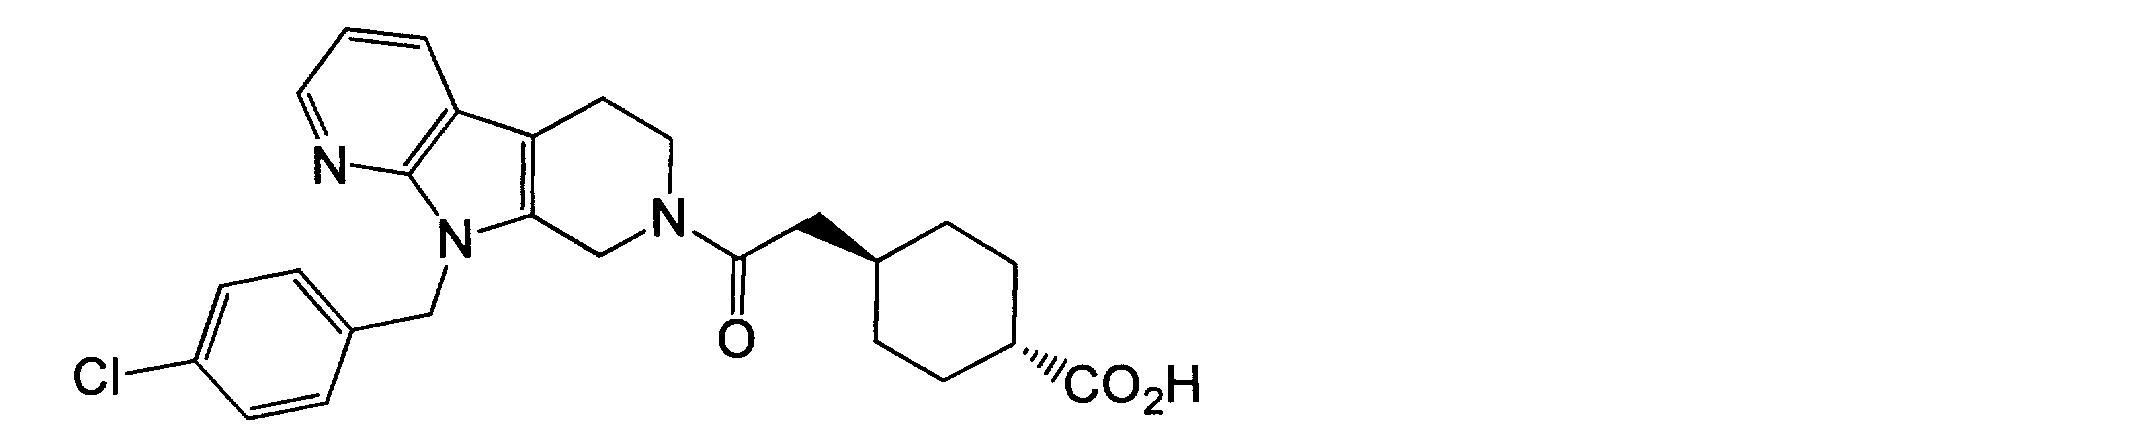 Figure JPOXMLDOC01-appb-C000089